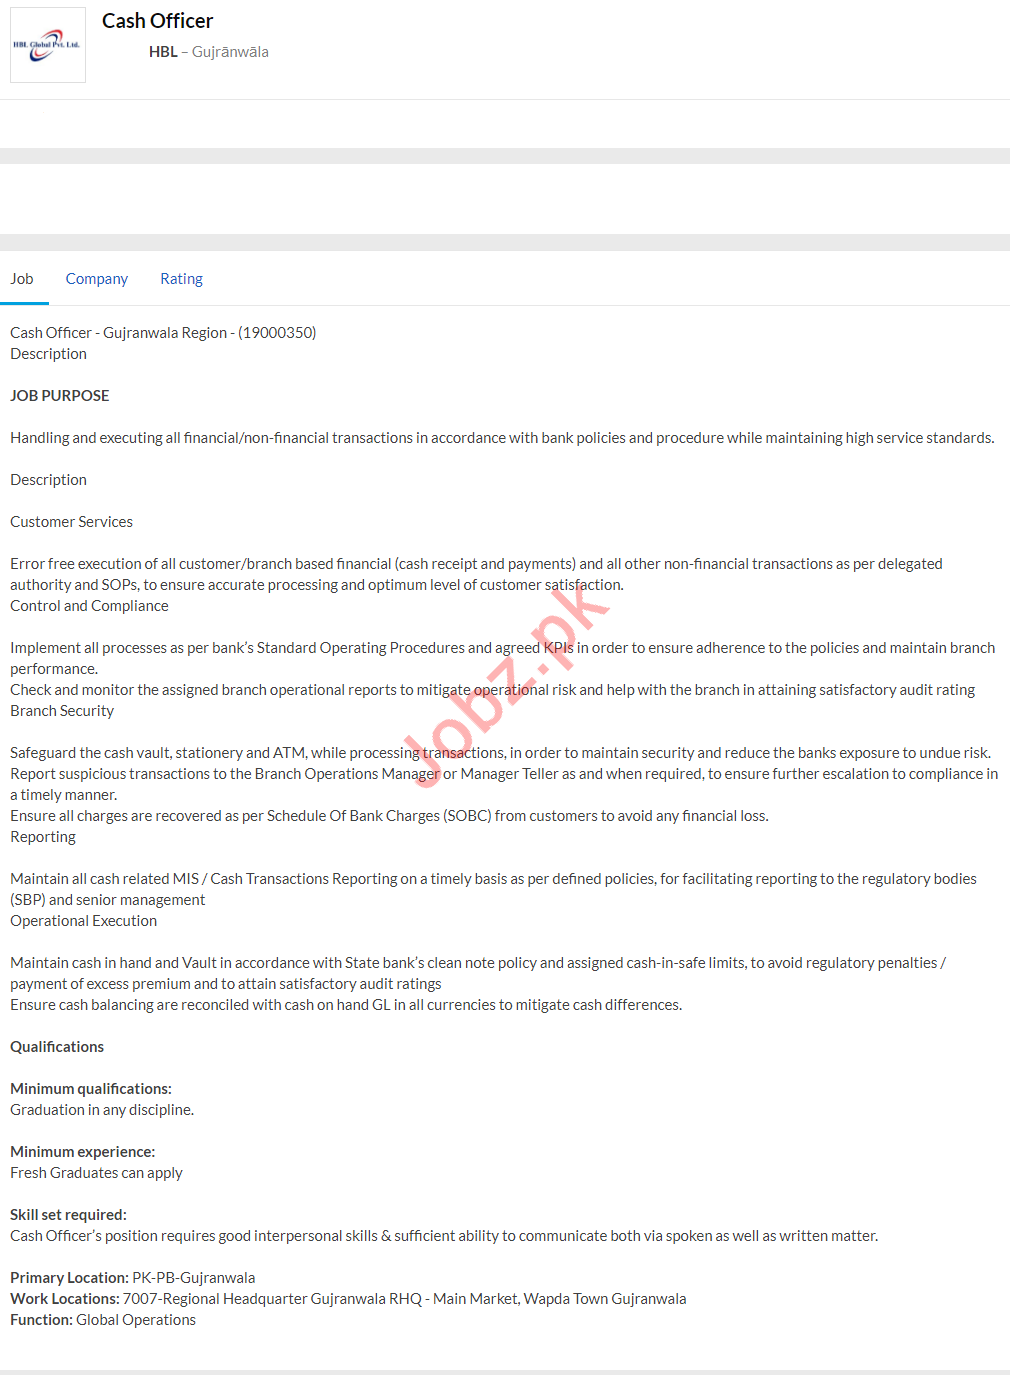 Cash Officer Job 2020 in Gujranwala